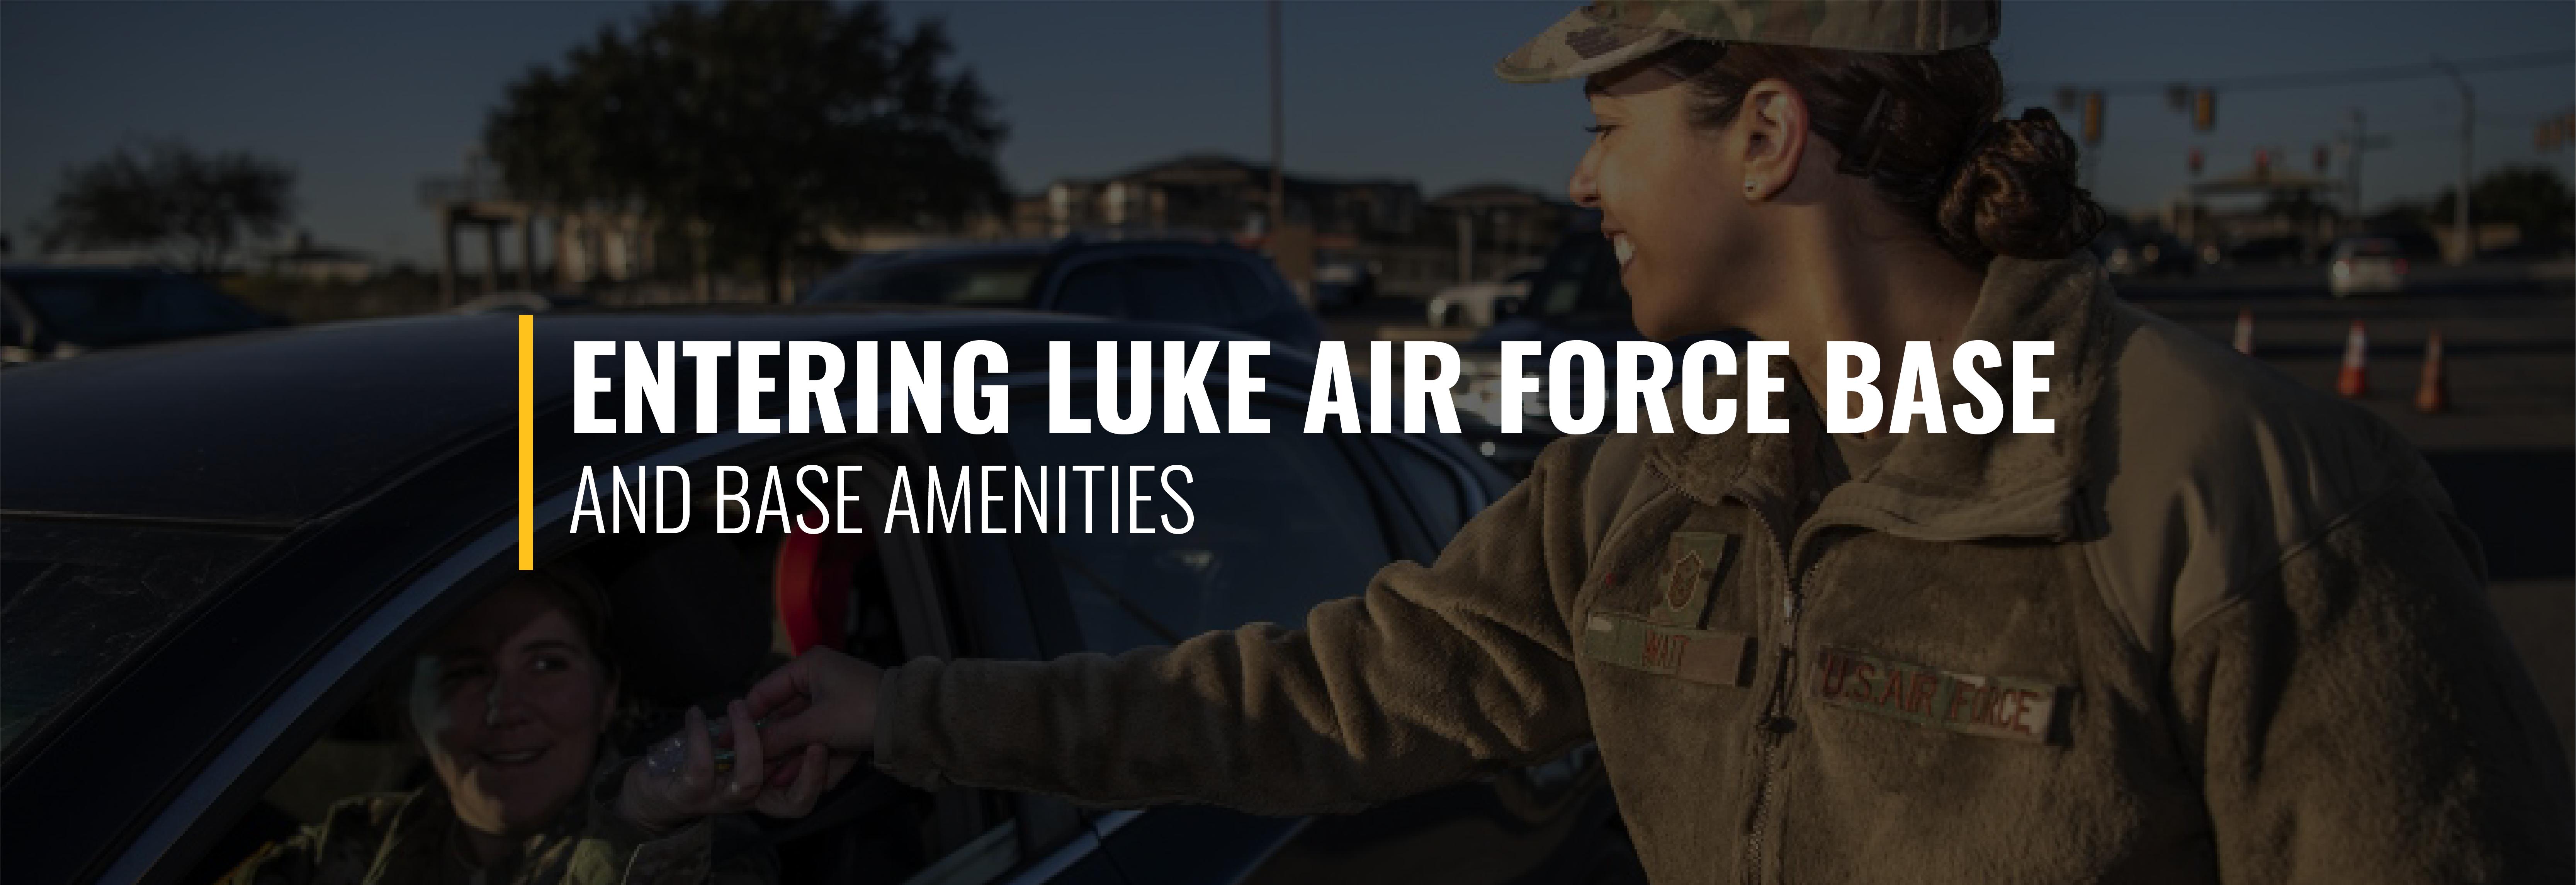 Entering Luke Air Force Base and Base Amenities